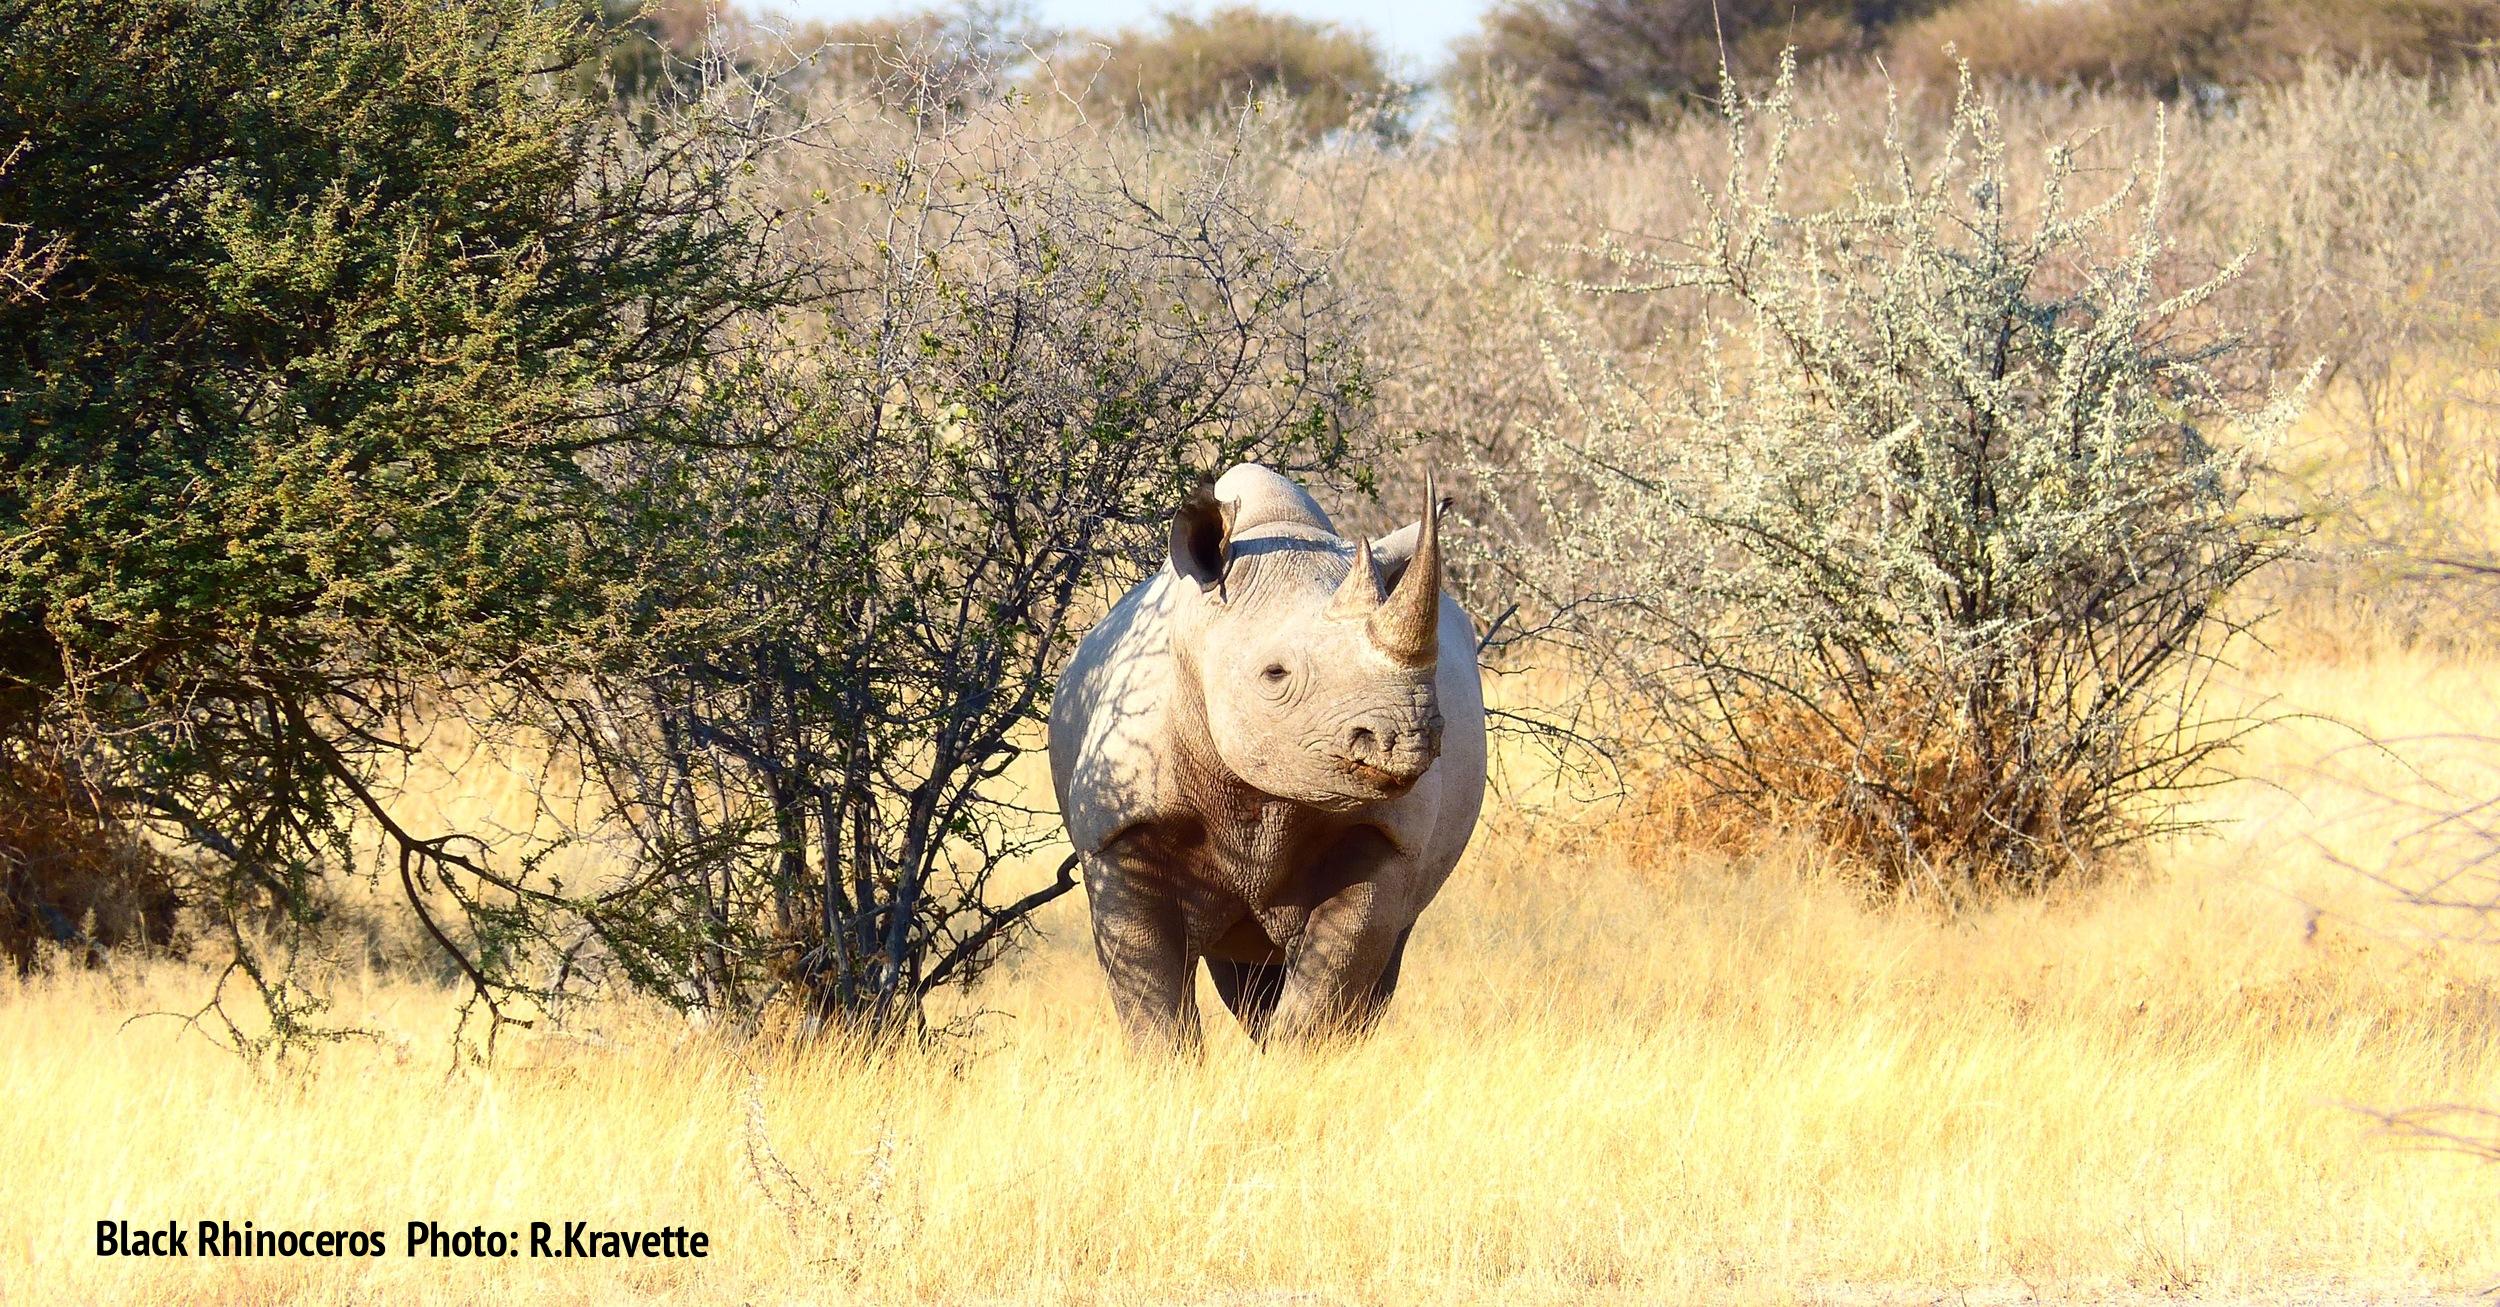 Wildlife Field Guide: African Rhino